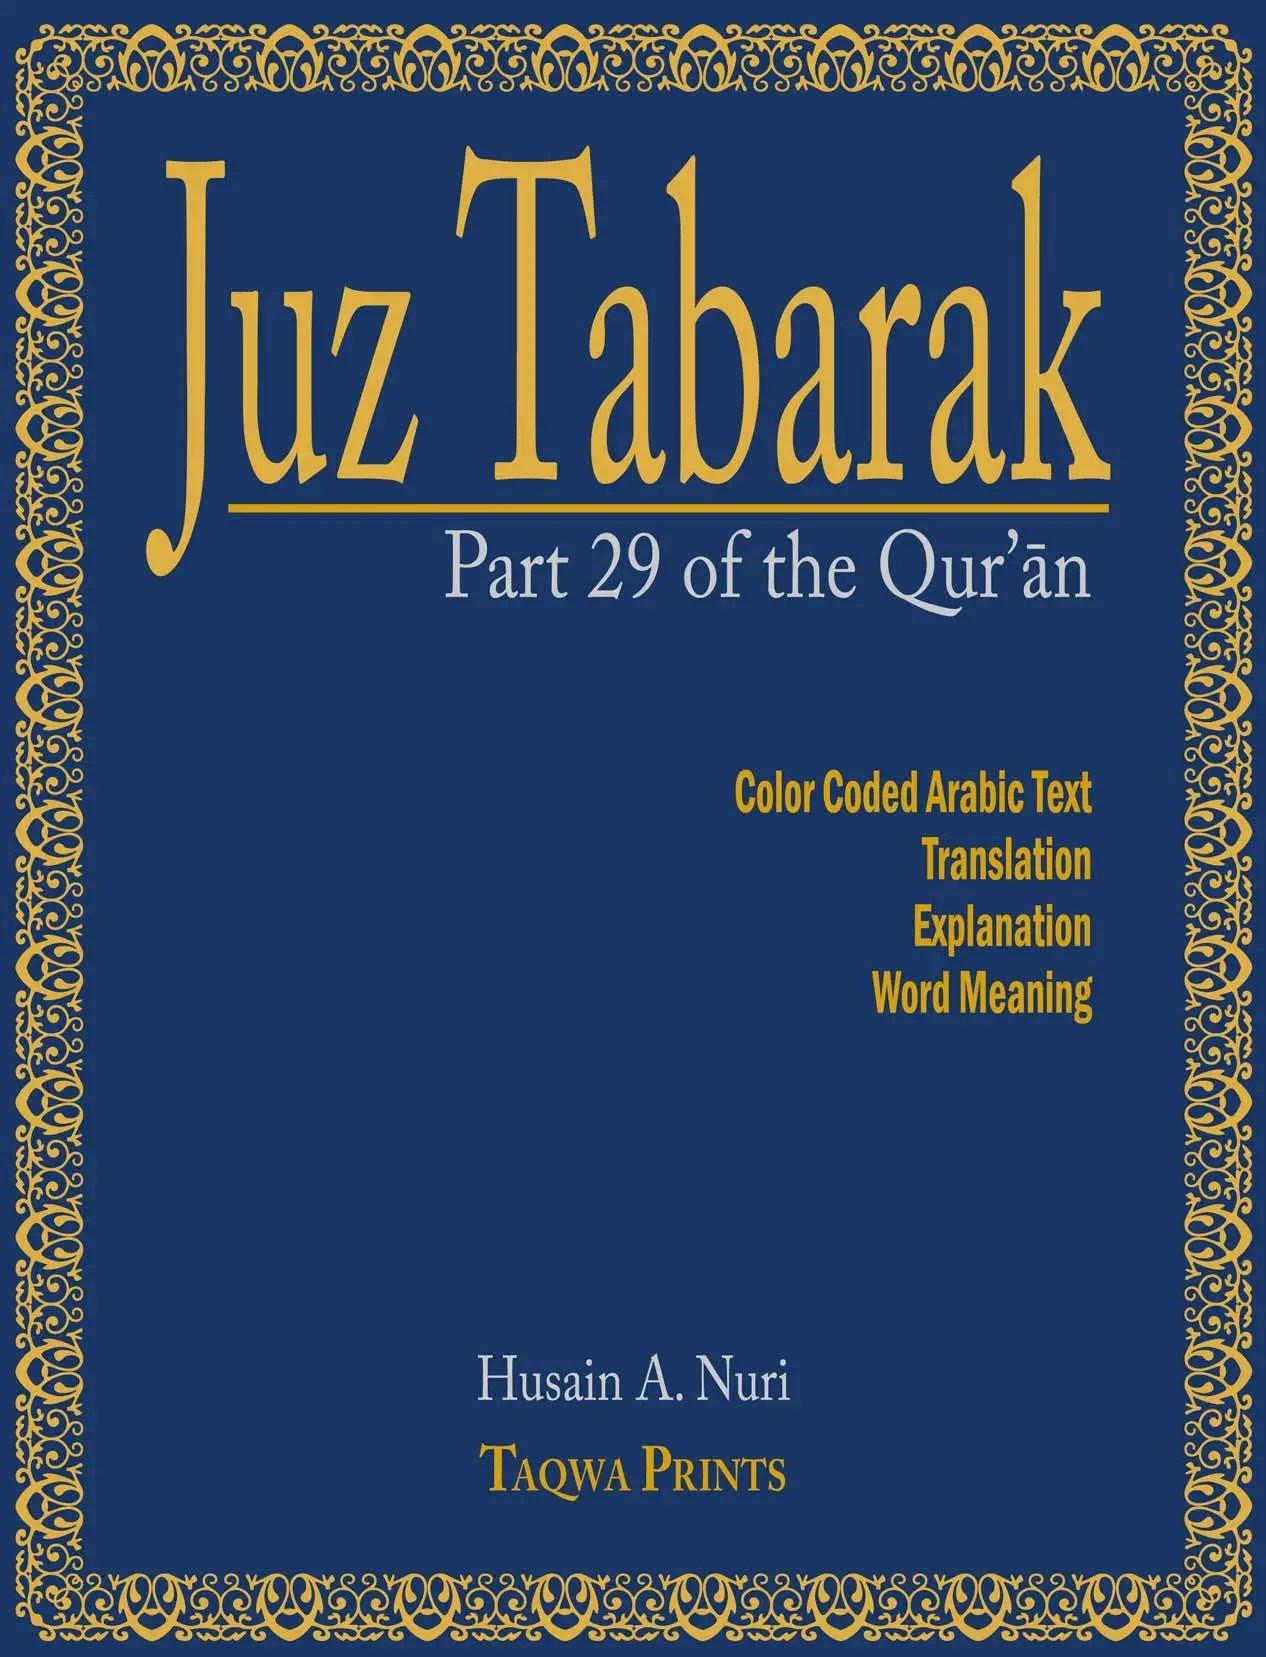 Juz Tabarak: Part 29 of the Qur'an - Islam Hashtag